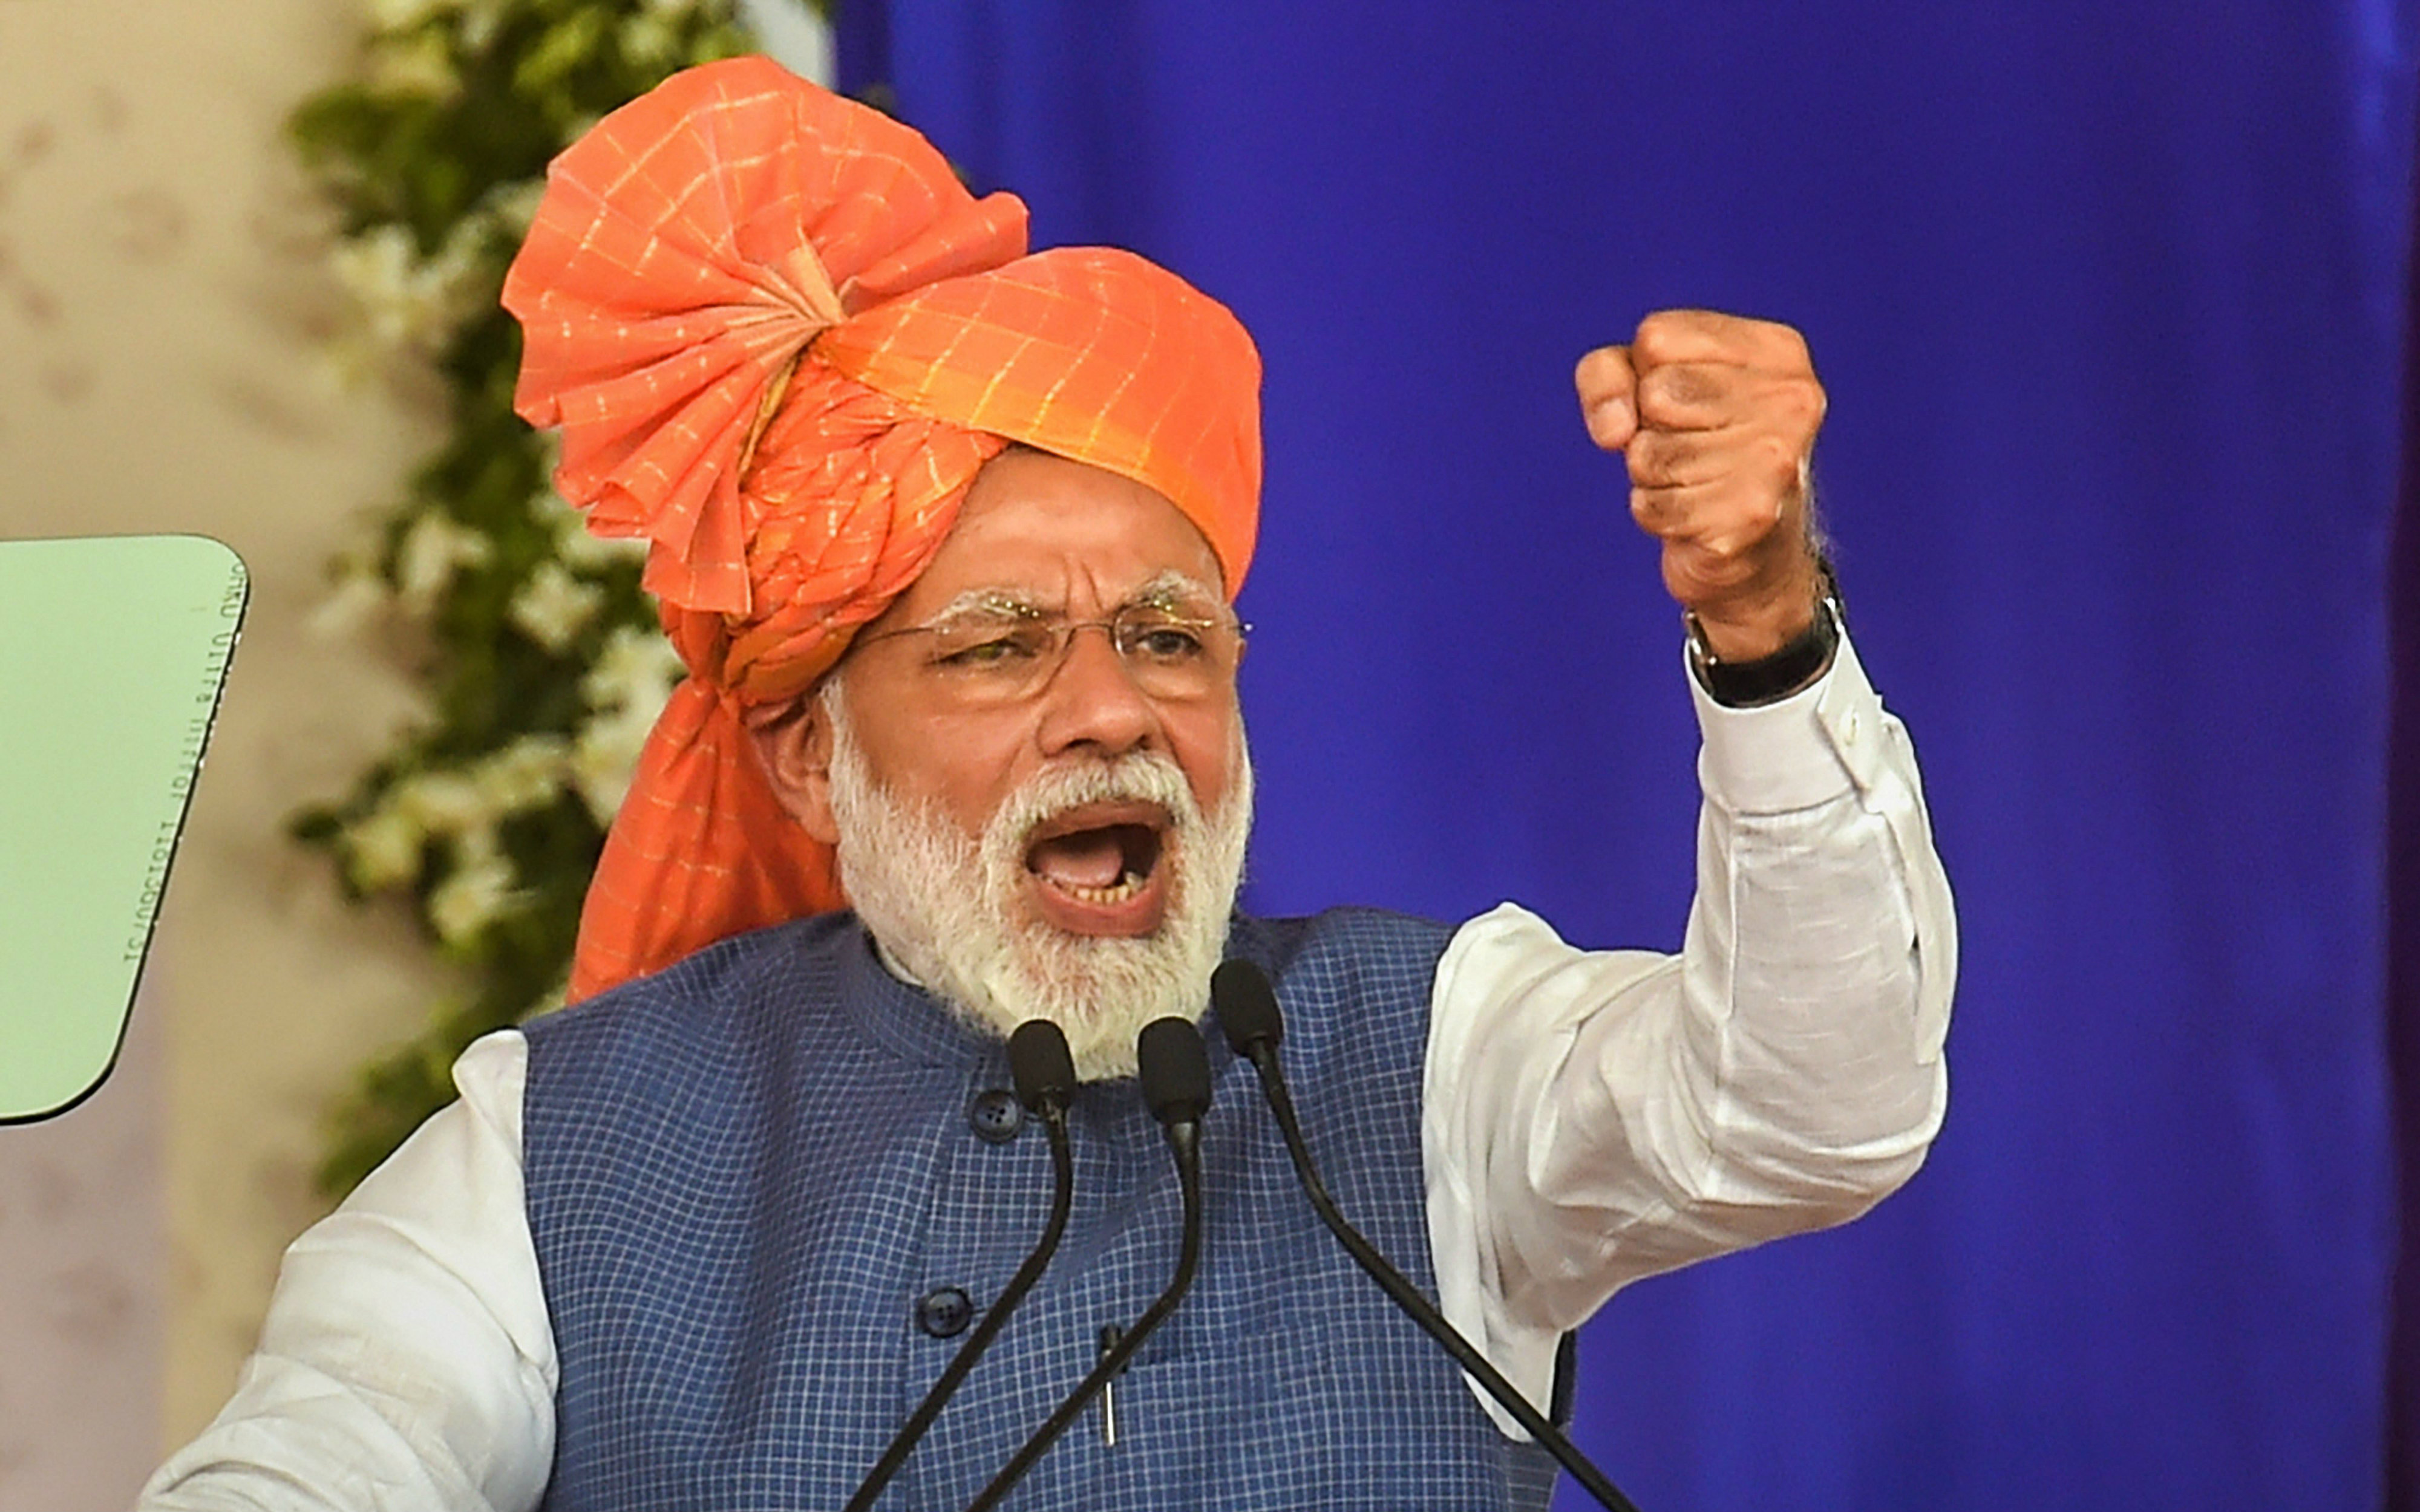 Narendra Modi launches the Pradhan Mantri Shram Yogi Pension Yojana for unorganised workers in Ahmedabad on Tuesday.